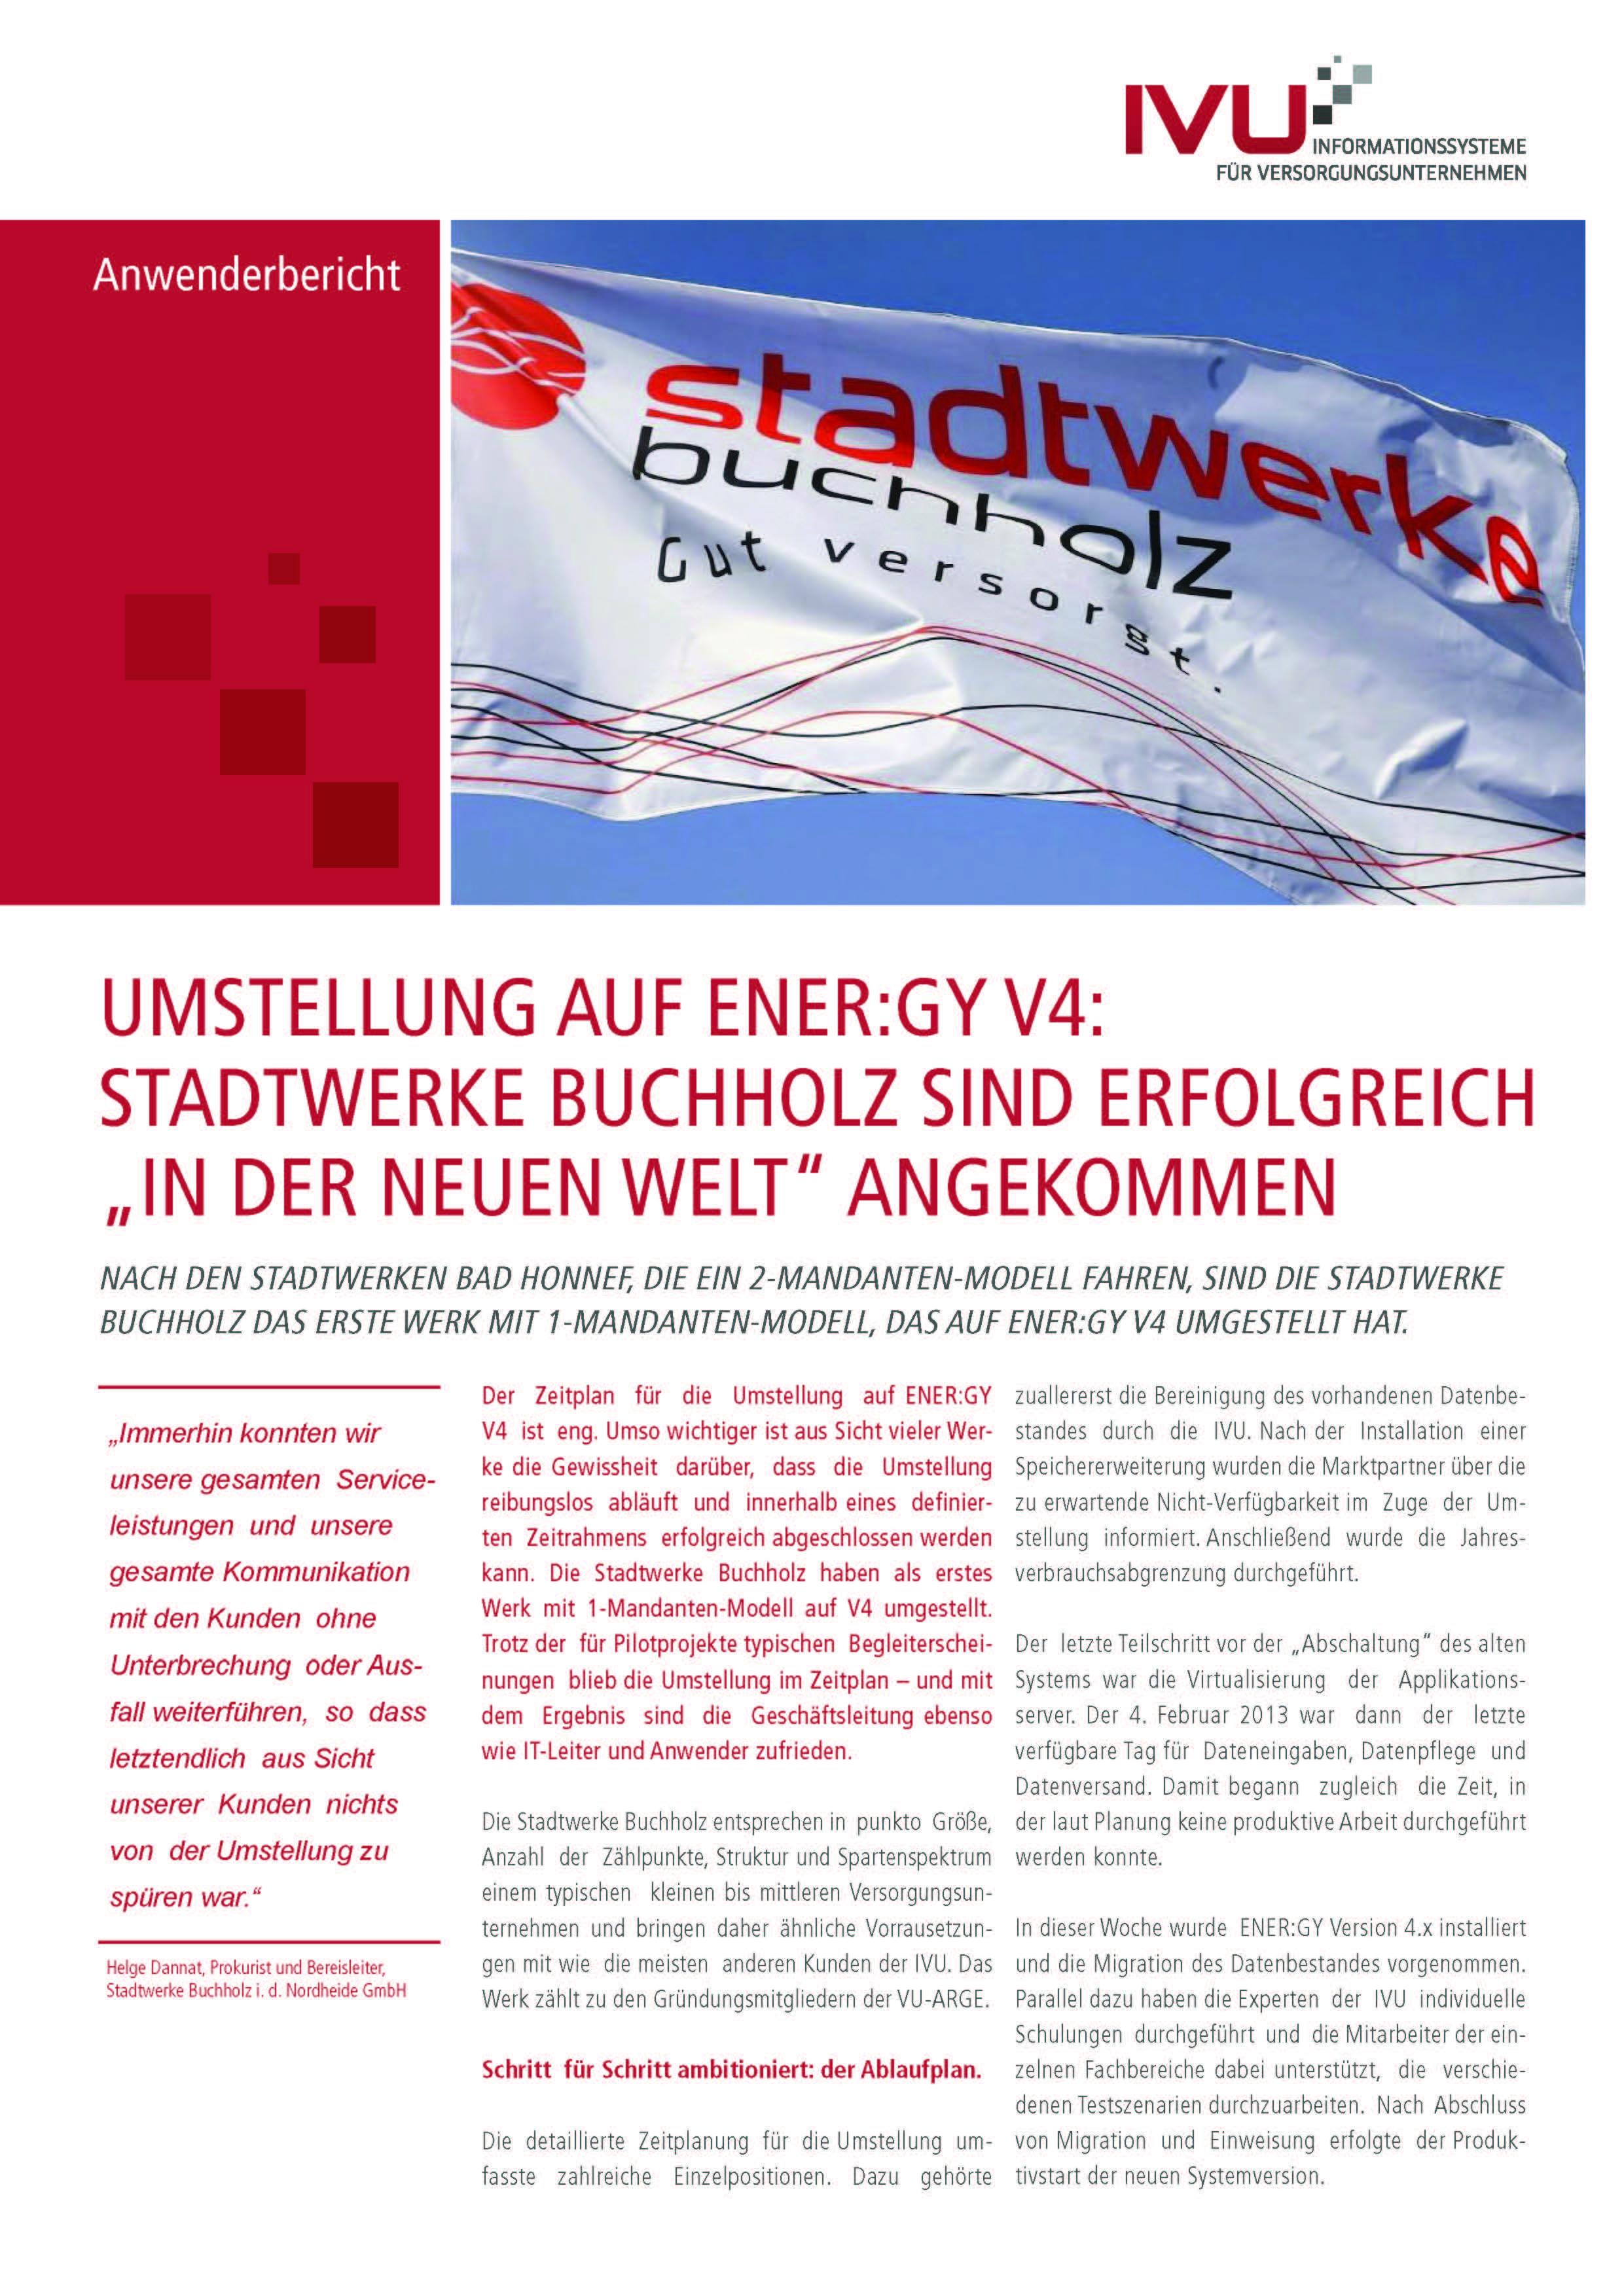 Anwenderbericht Stadtwerke Buchholz ENER:GY V4